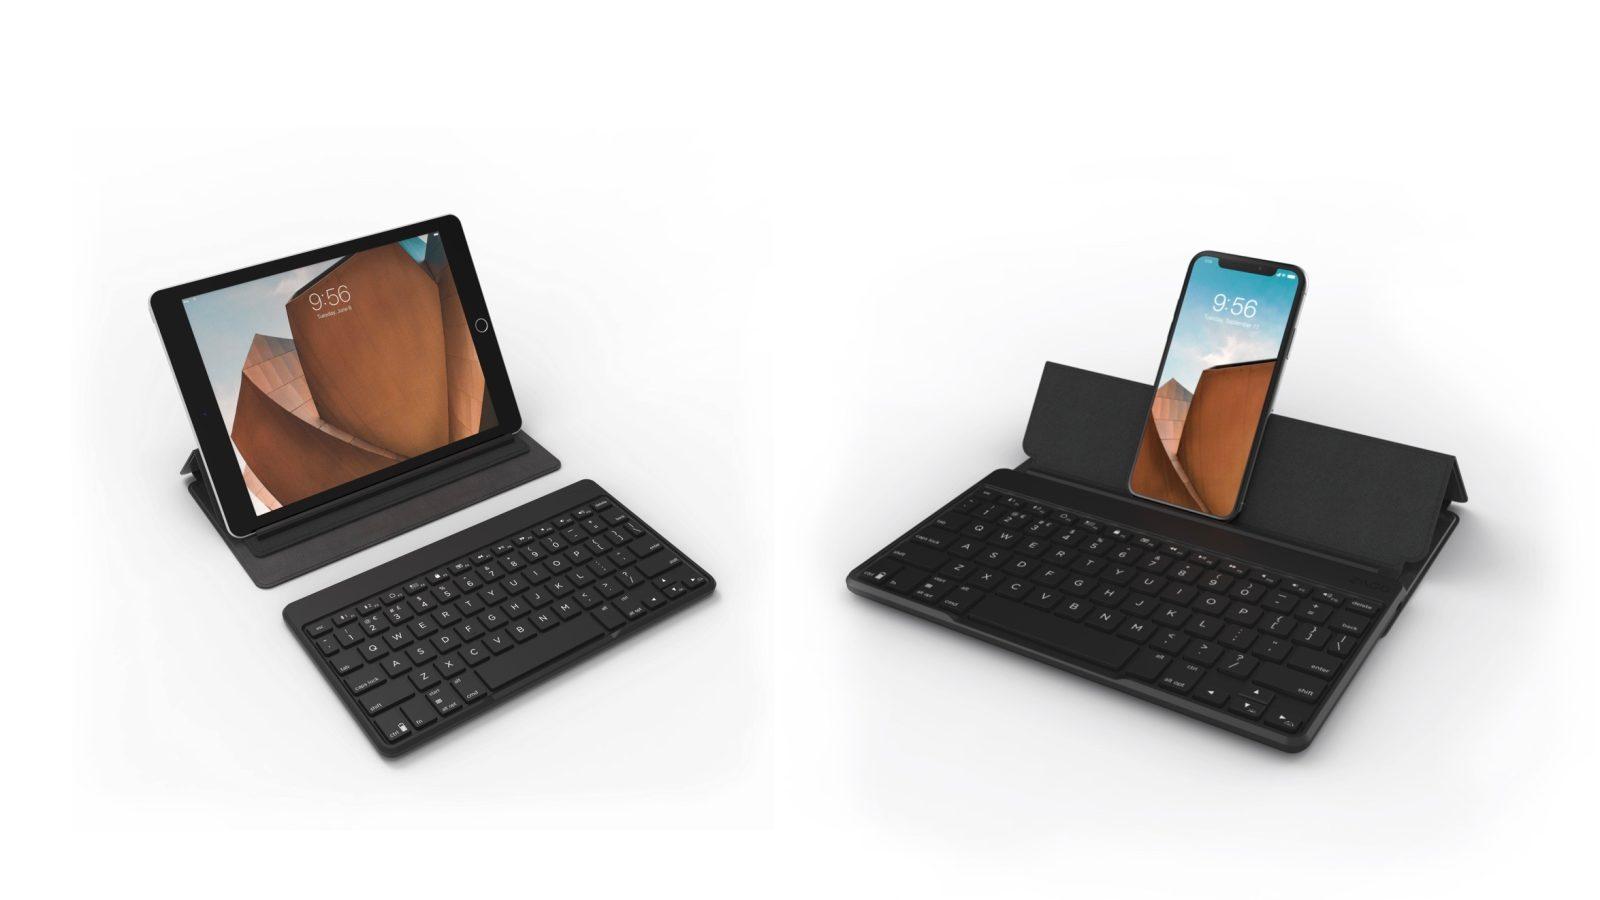 Zagg unveils new 'flex' versatile keyboard for iPhone, iPad, Apple TV, more